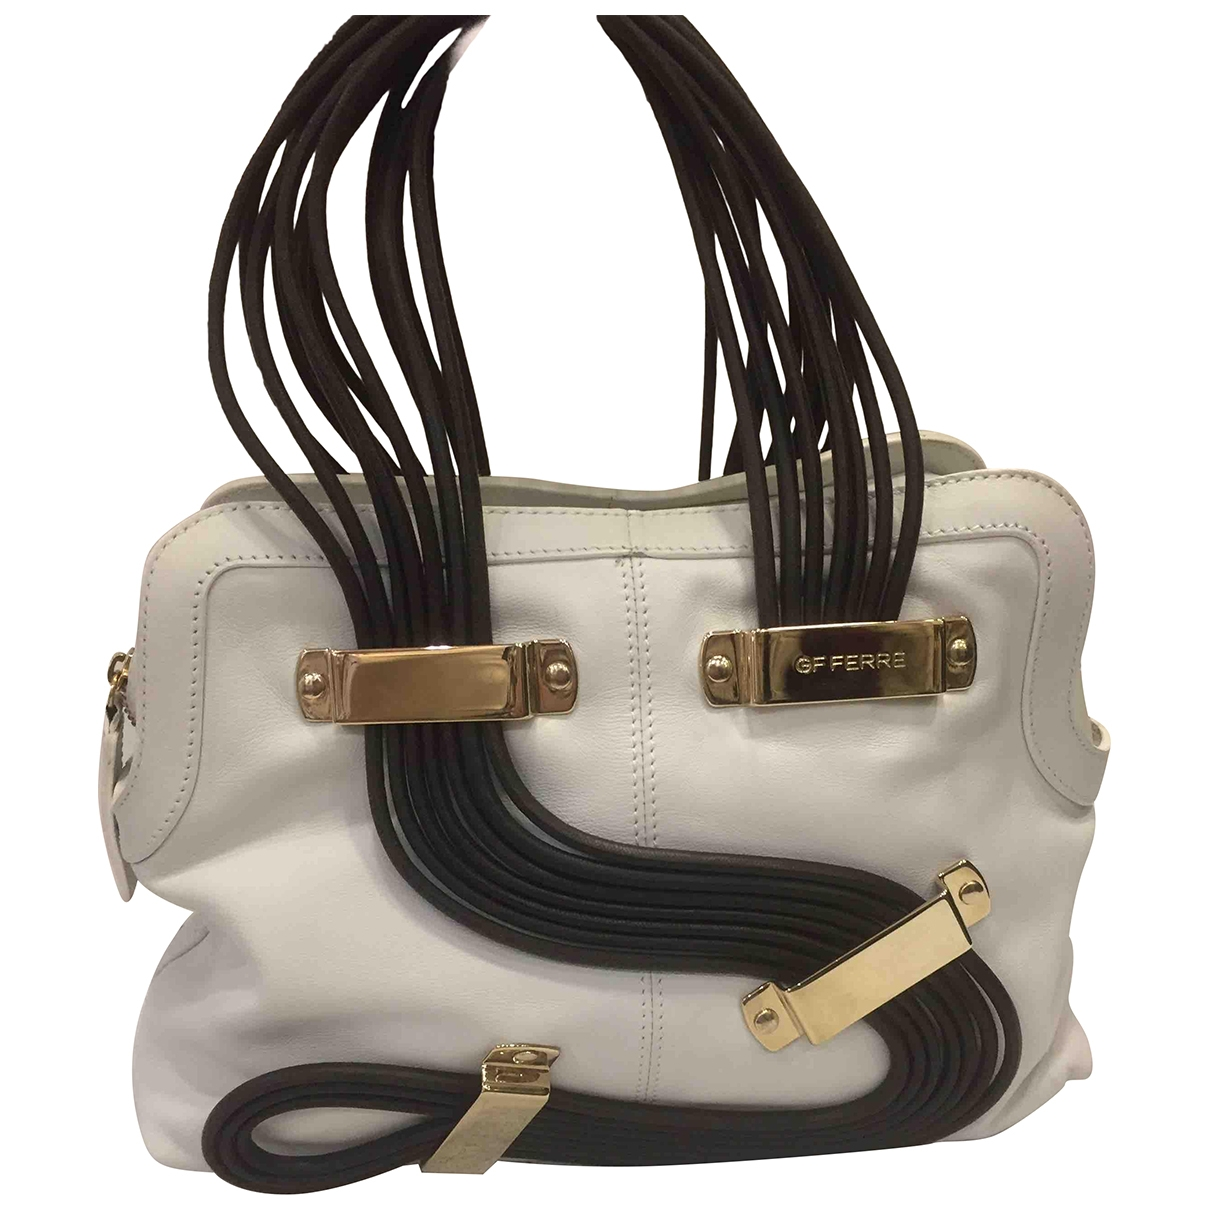 Gianfranco Ferré \N Leather handbag for Women \N